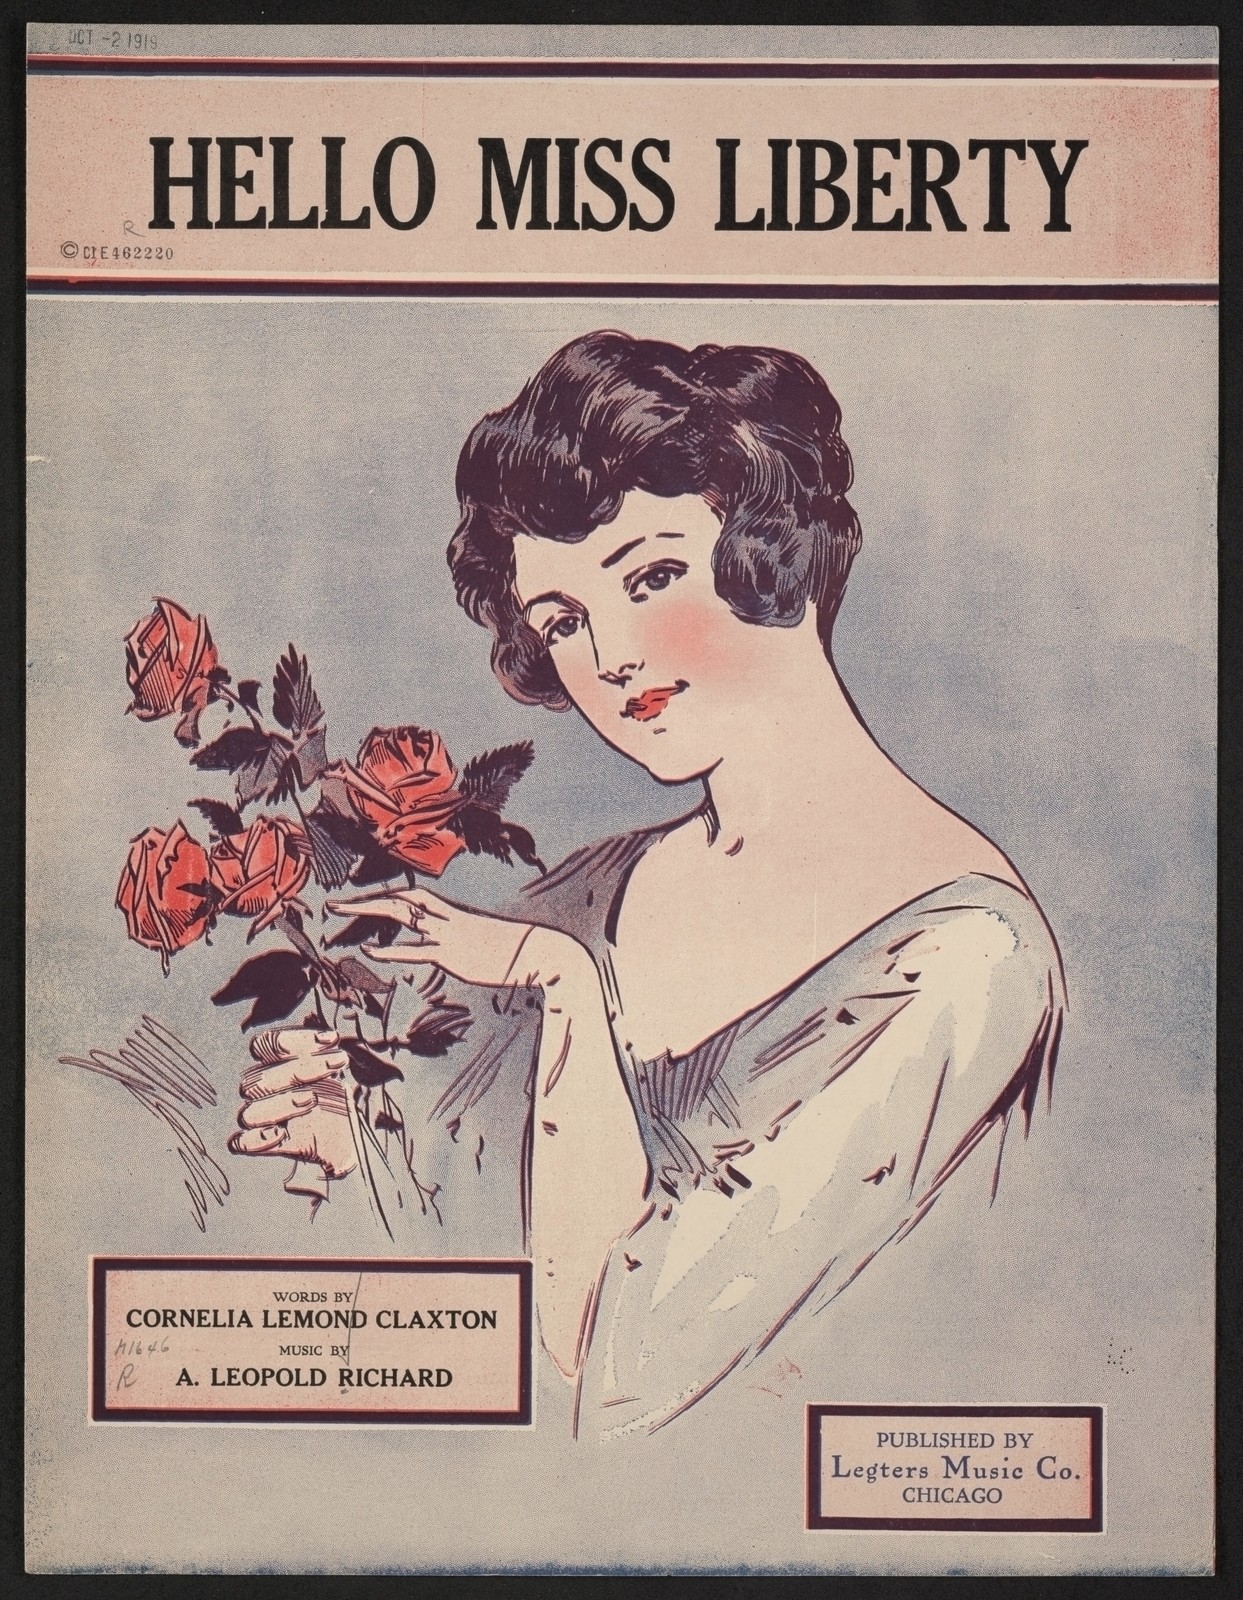 Hello miss liberty